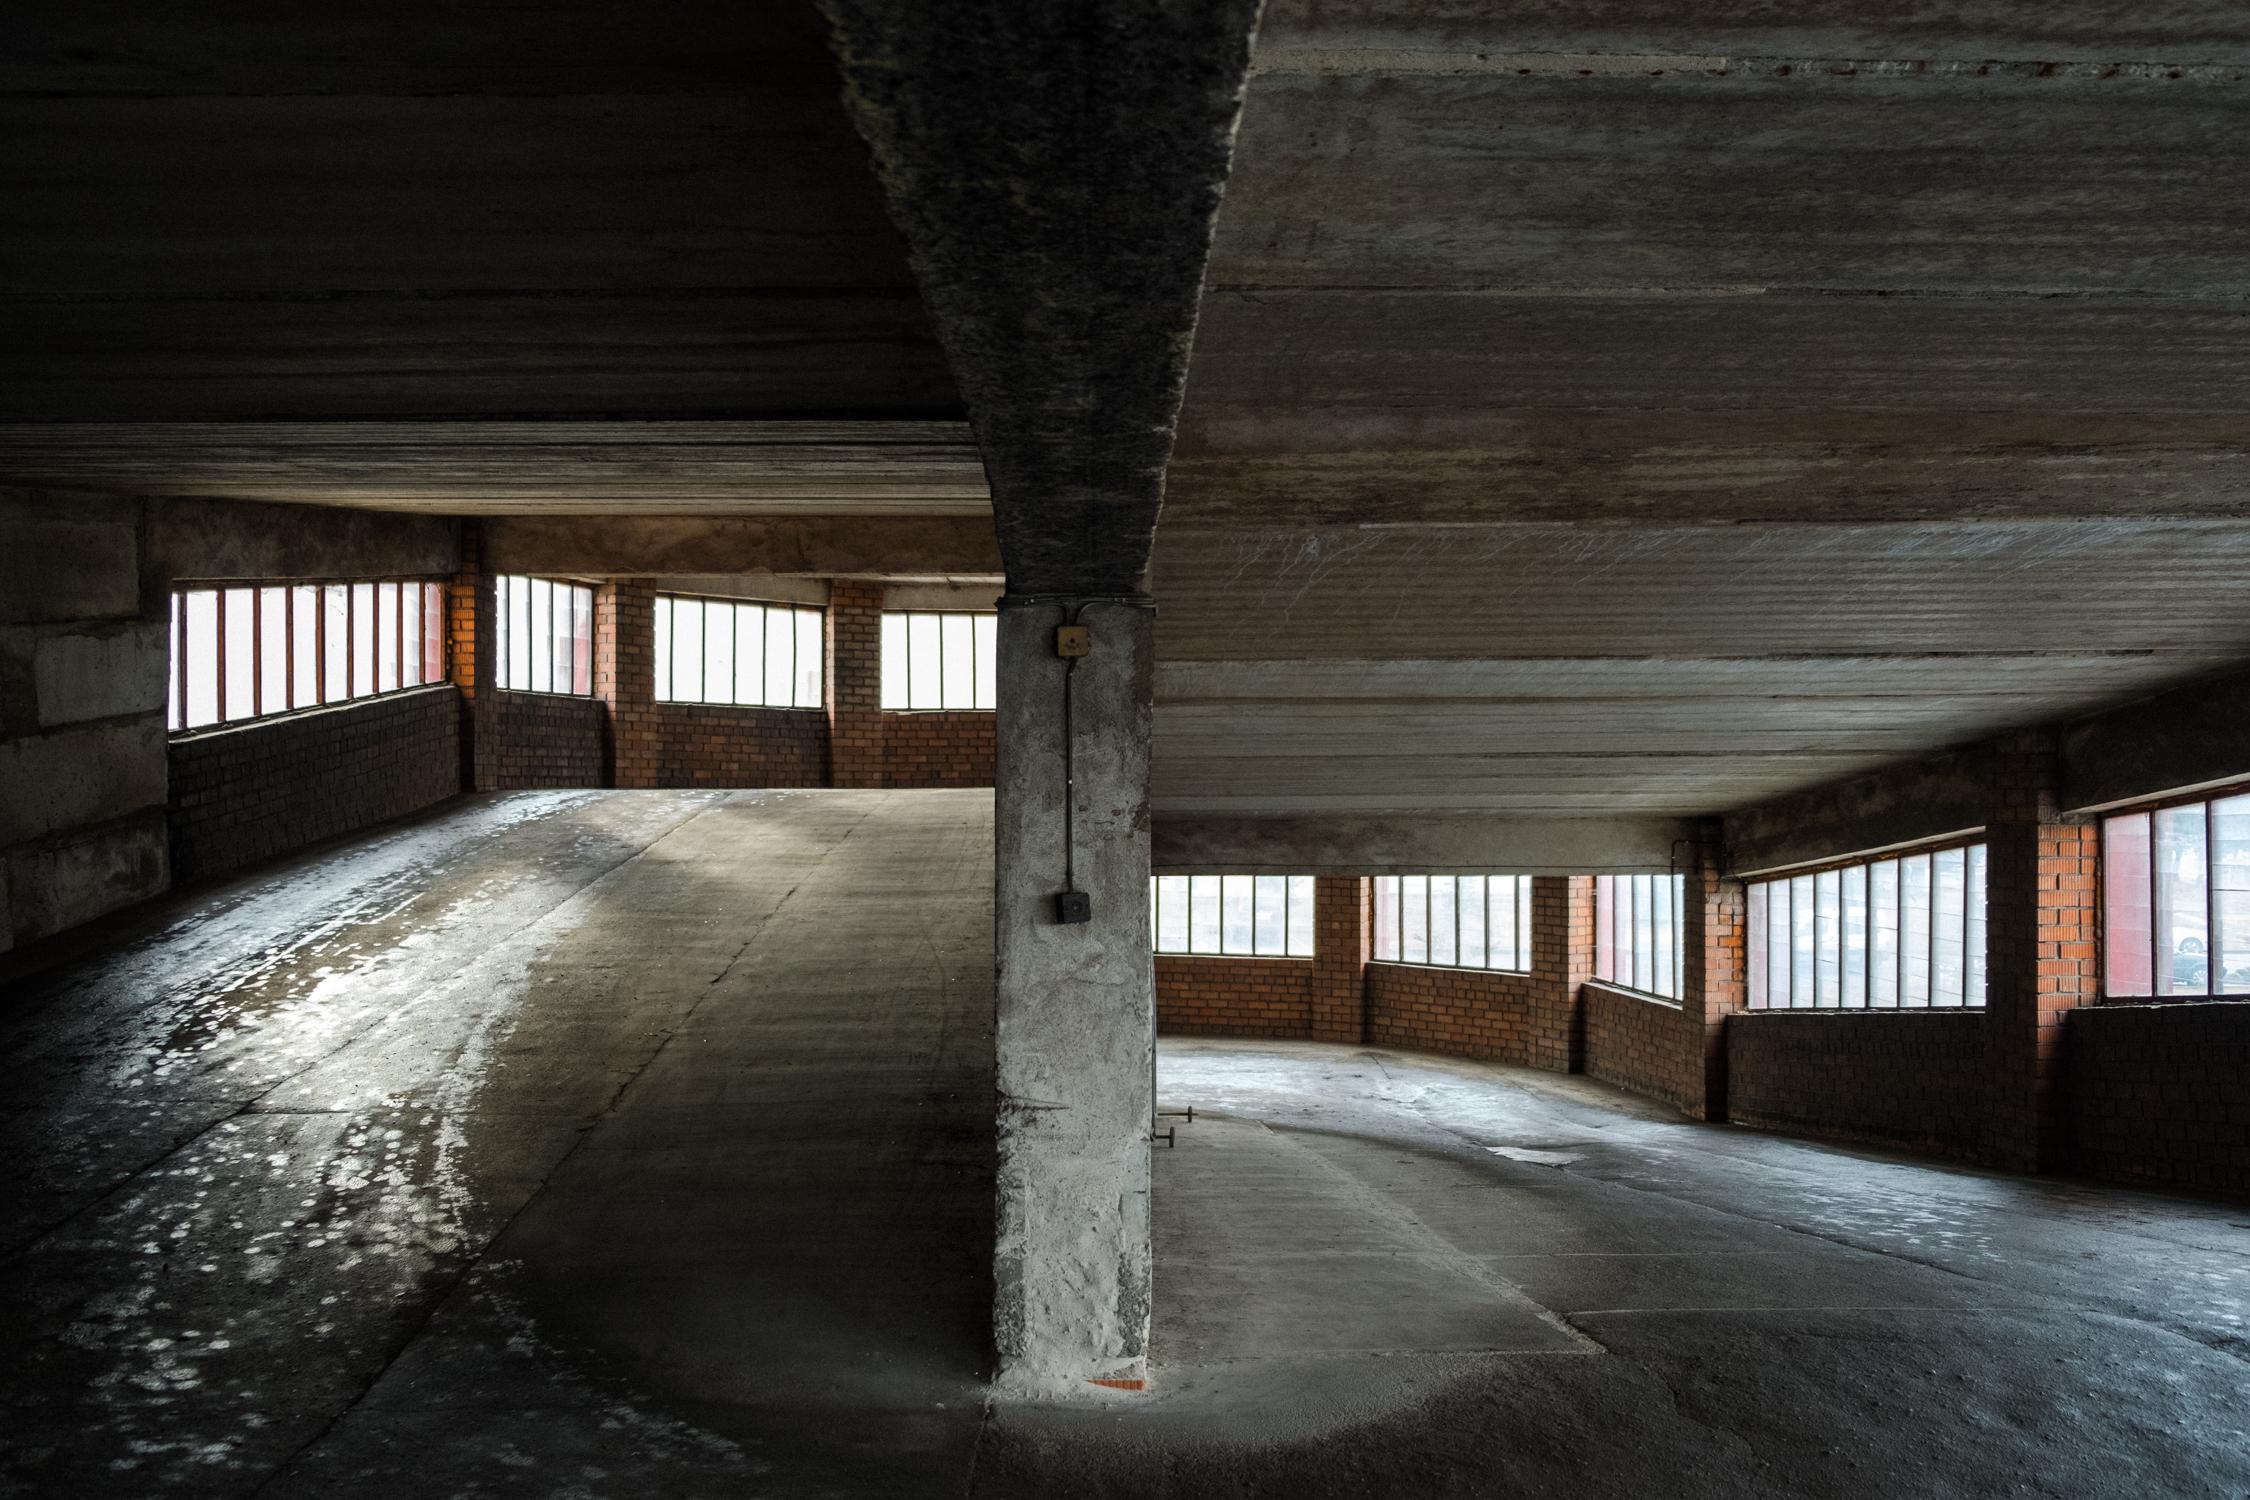 Linnamäe_Tee_parking_house_Parkla_Garage_-3.JPG